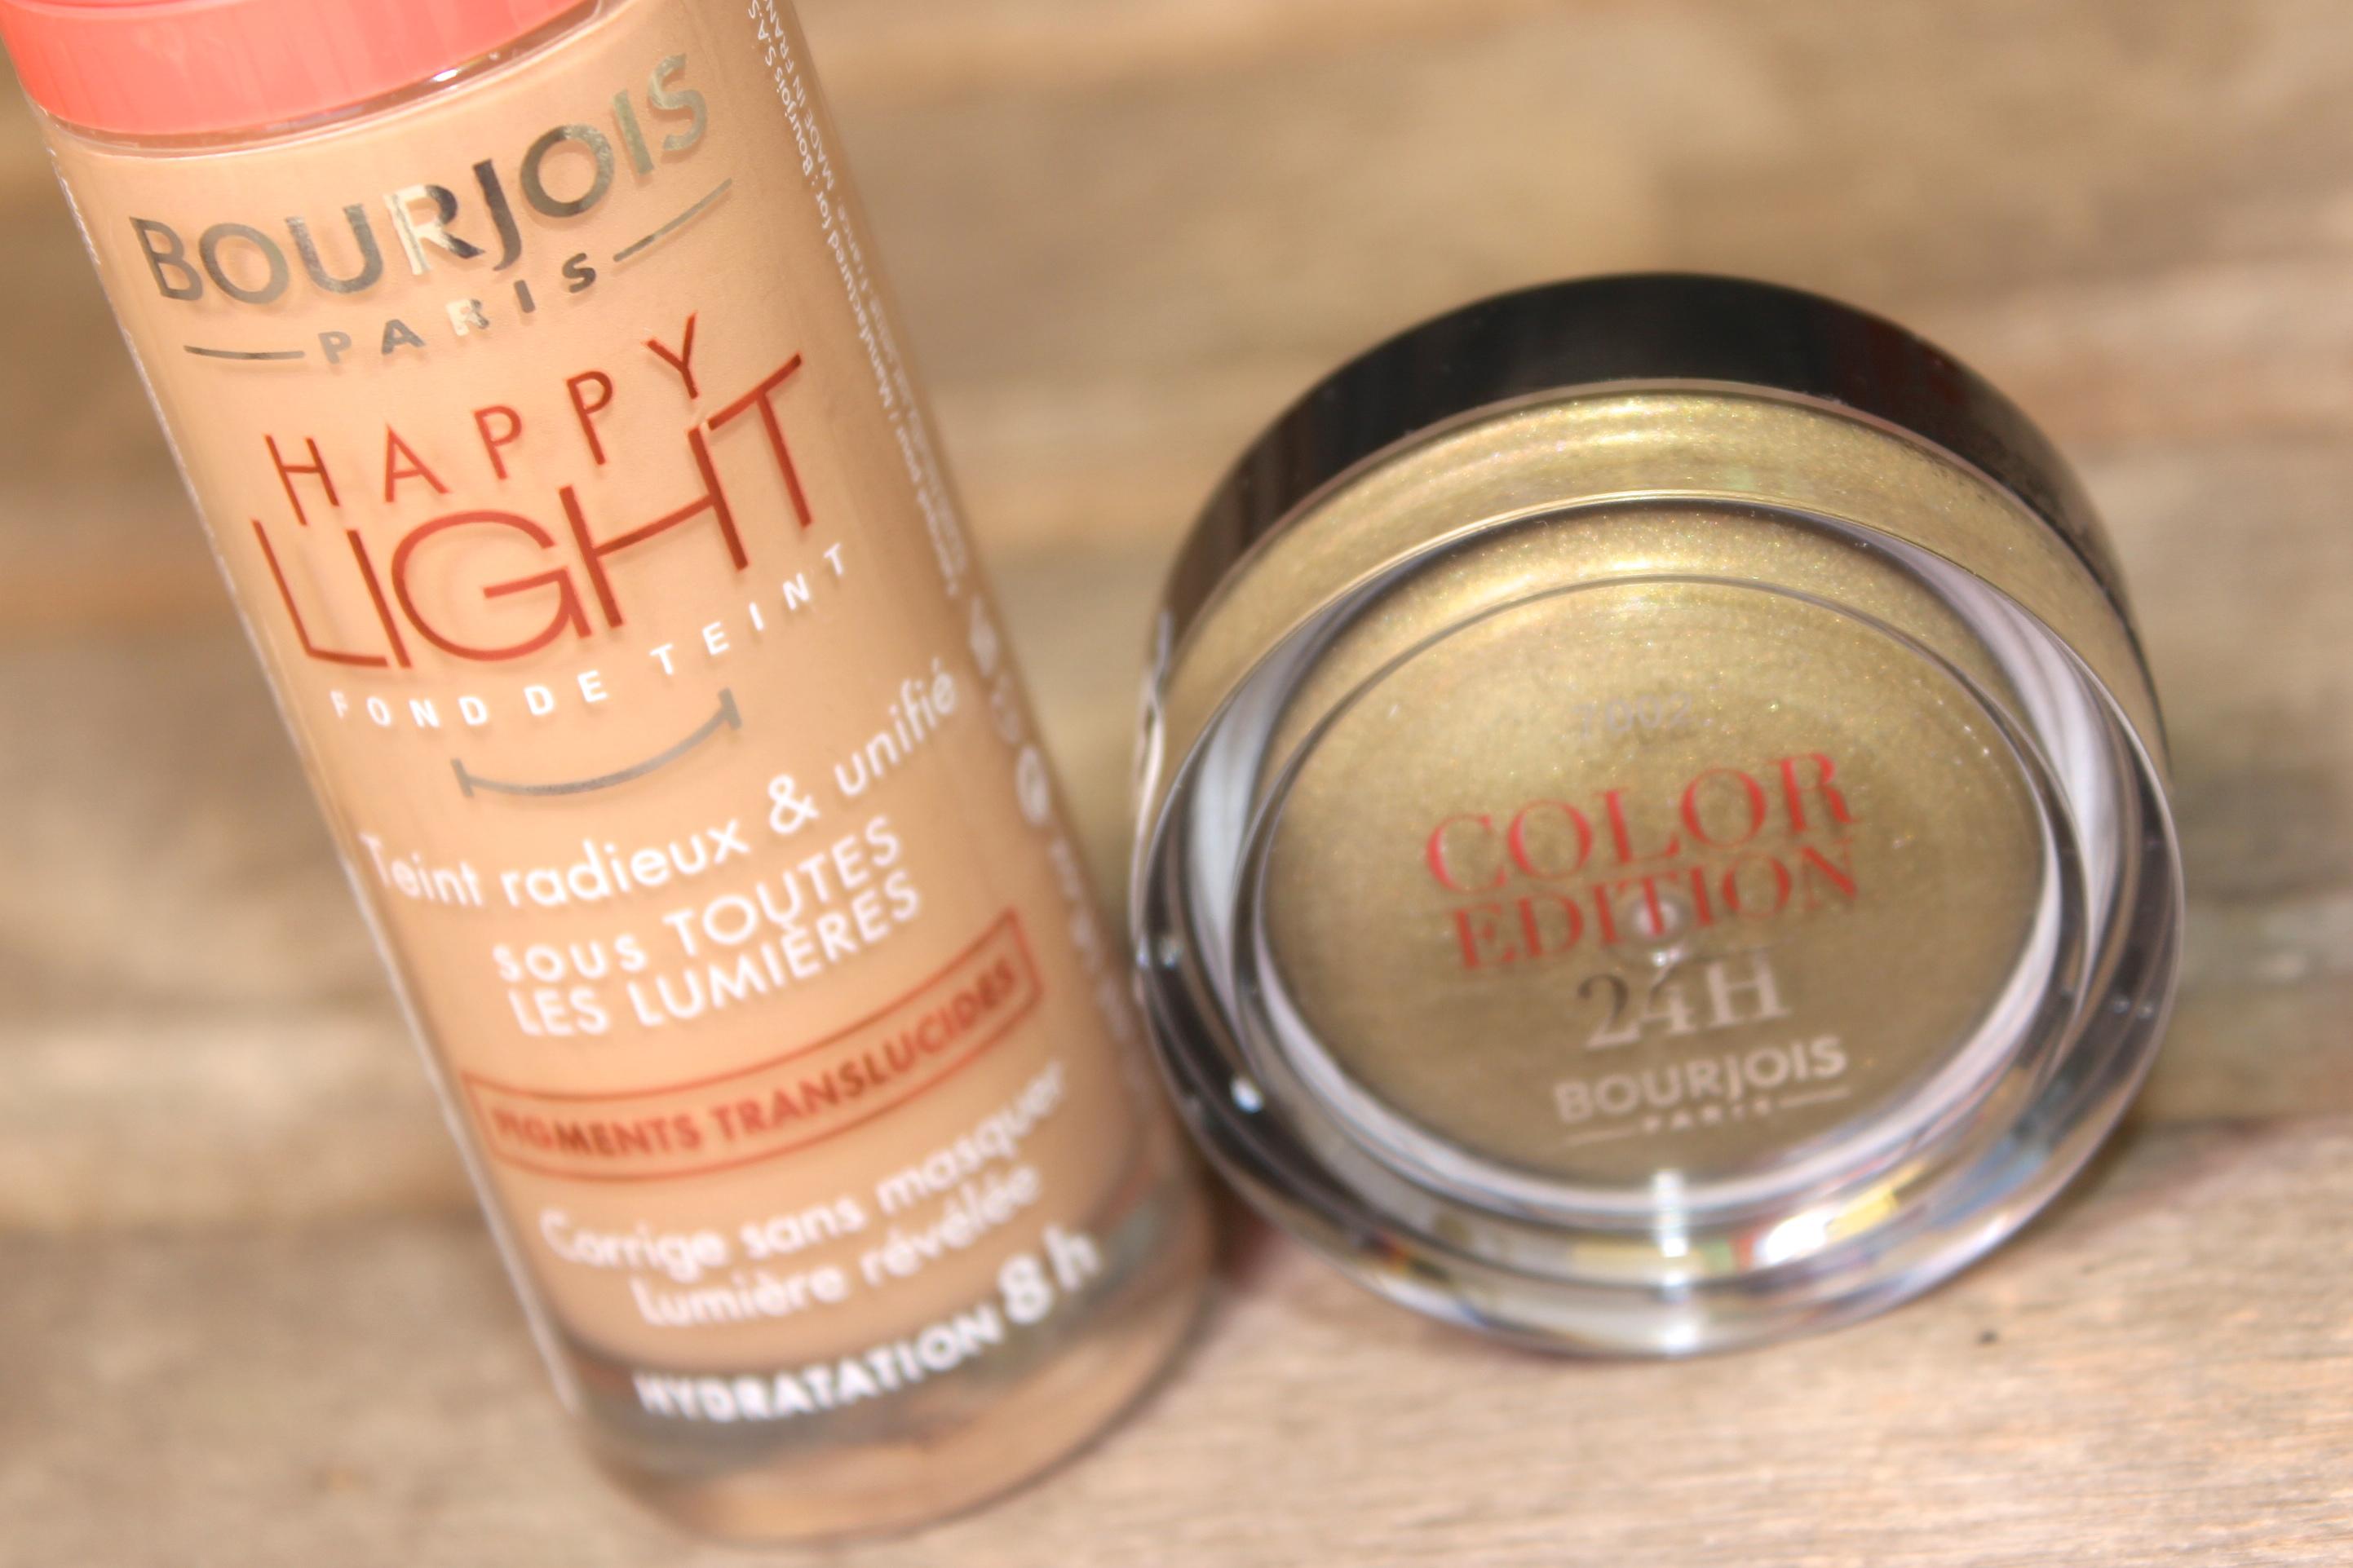 Bourjoist happy light foundation n52 light beige Color edition 24h kaki cheri 1